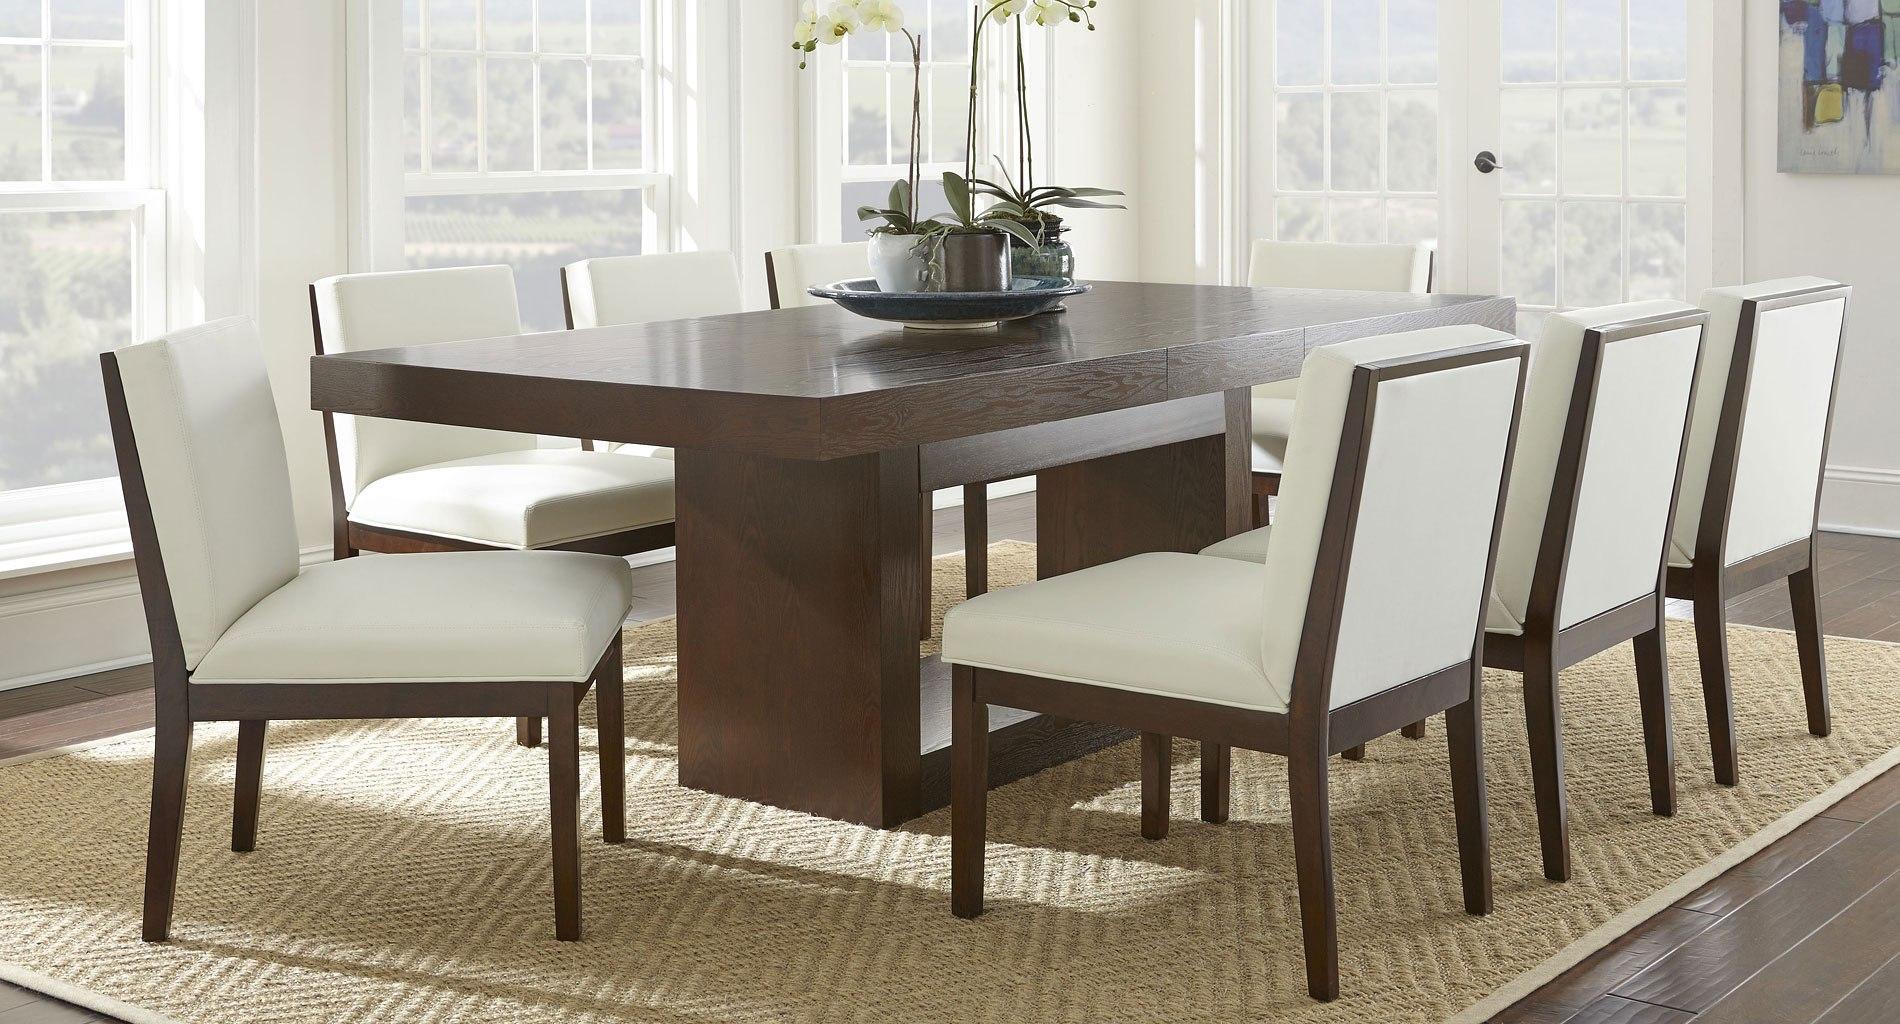 antonio dining room set w emma white chairs by steve silver rh furniturepick com Room Emma Donoghue Emma and Ellie's Room